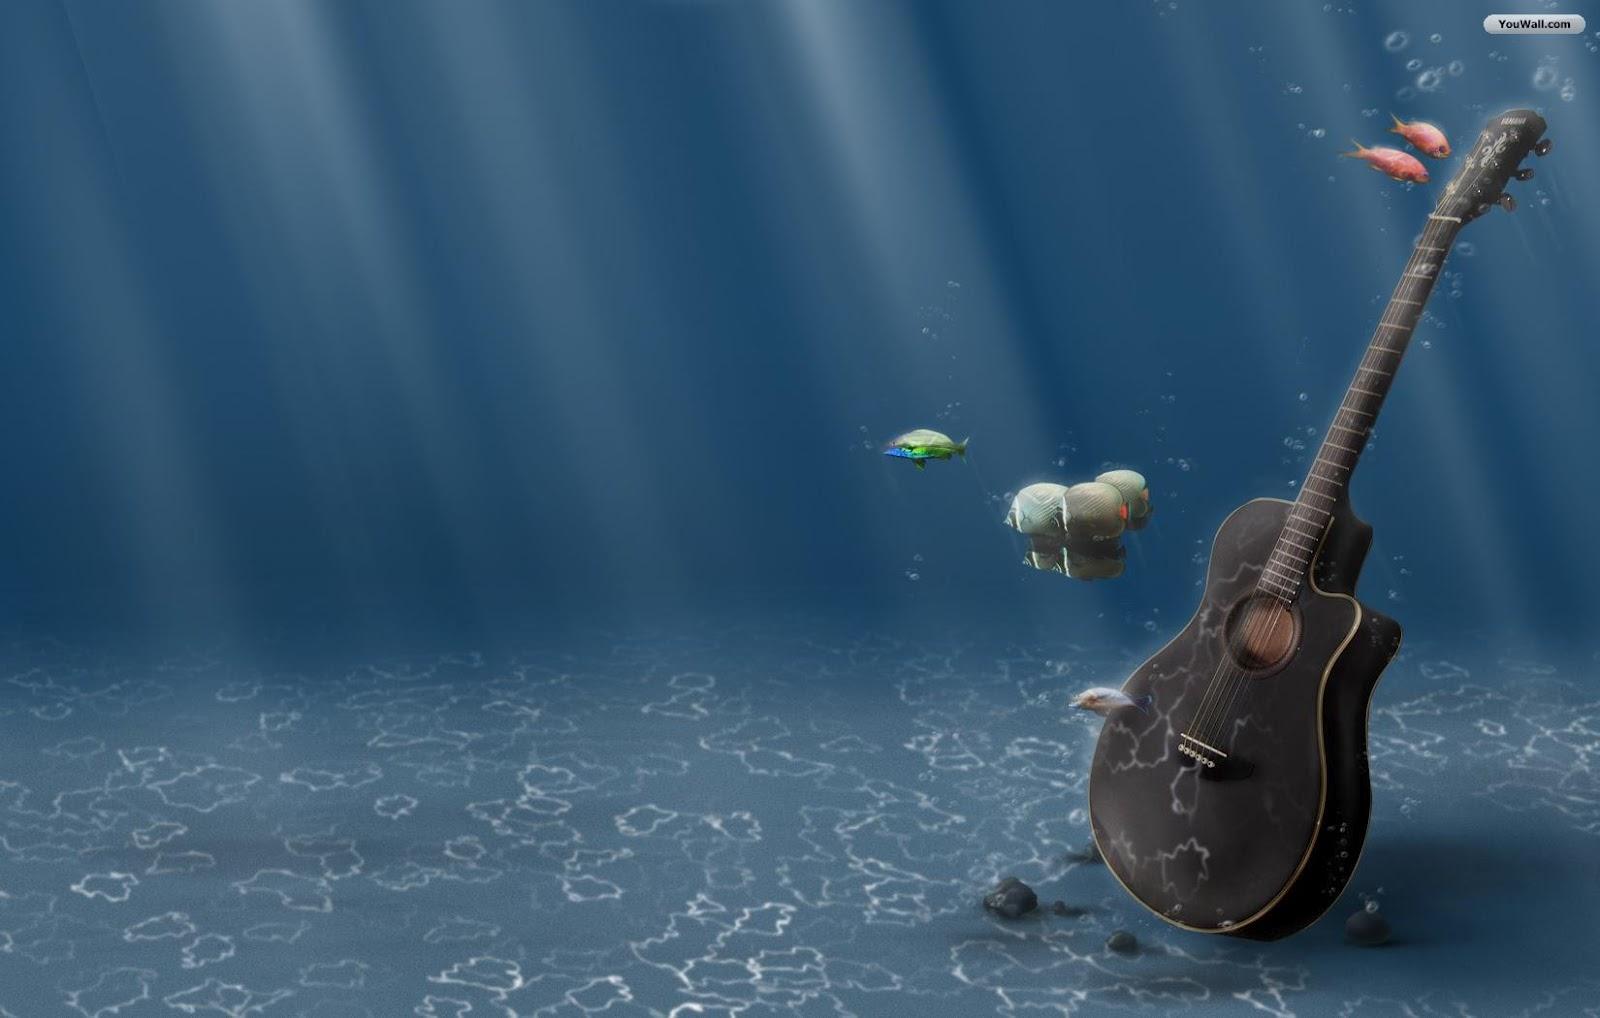 Download image tags animasi 3d bergerak wallpaper desktop pc android